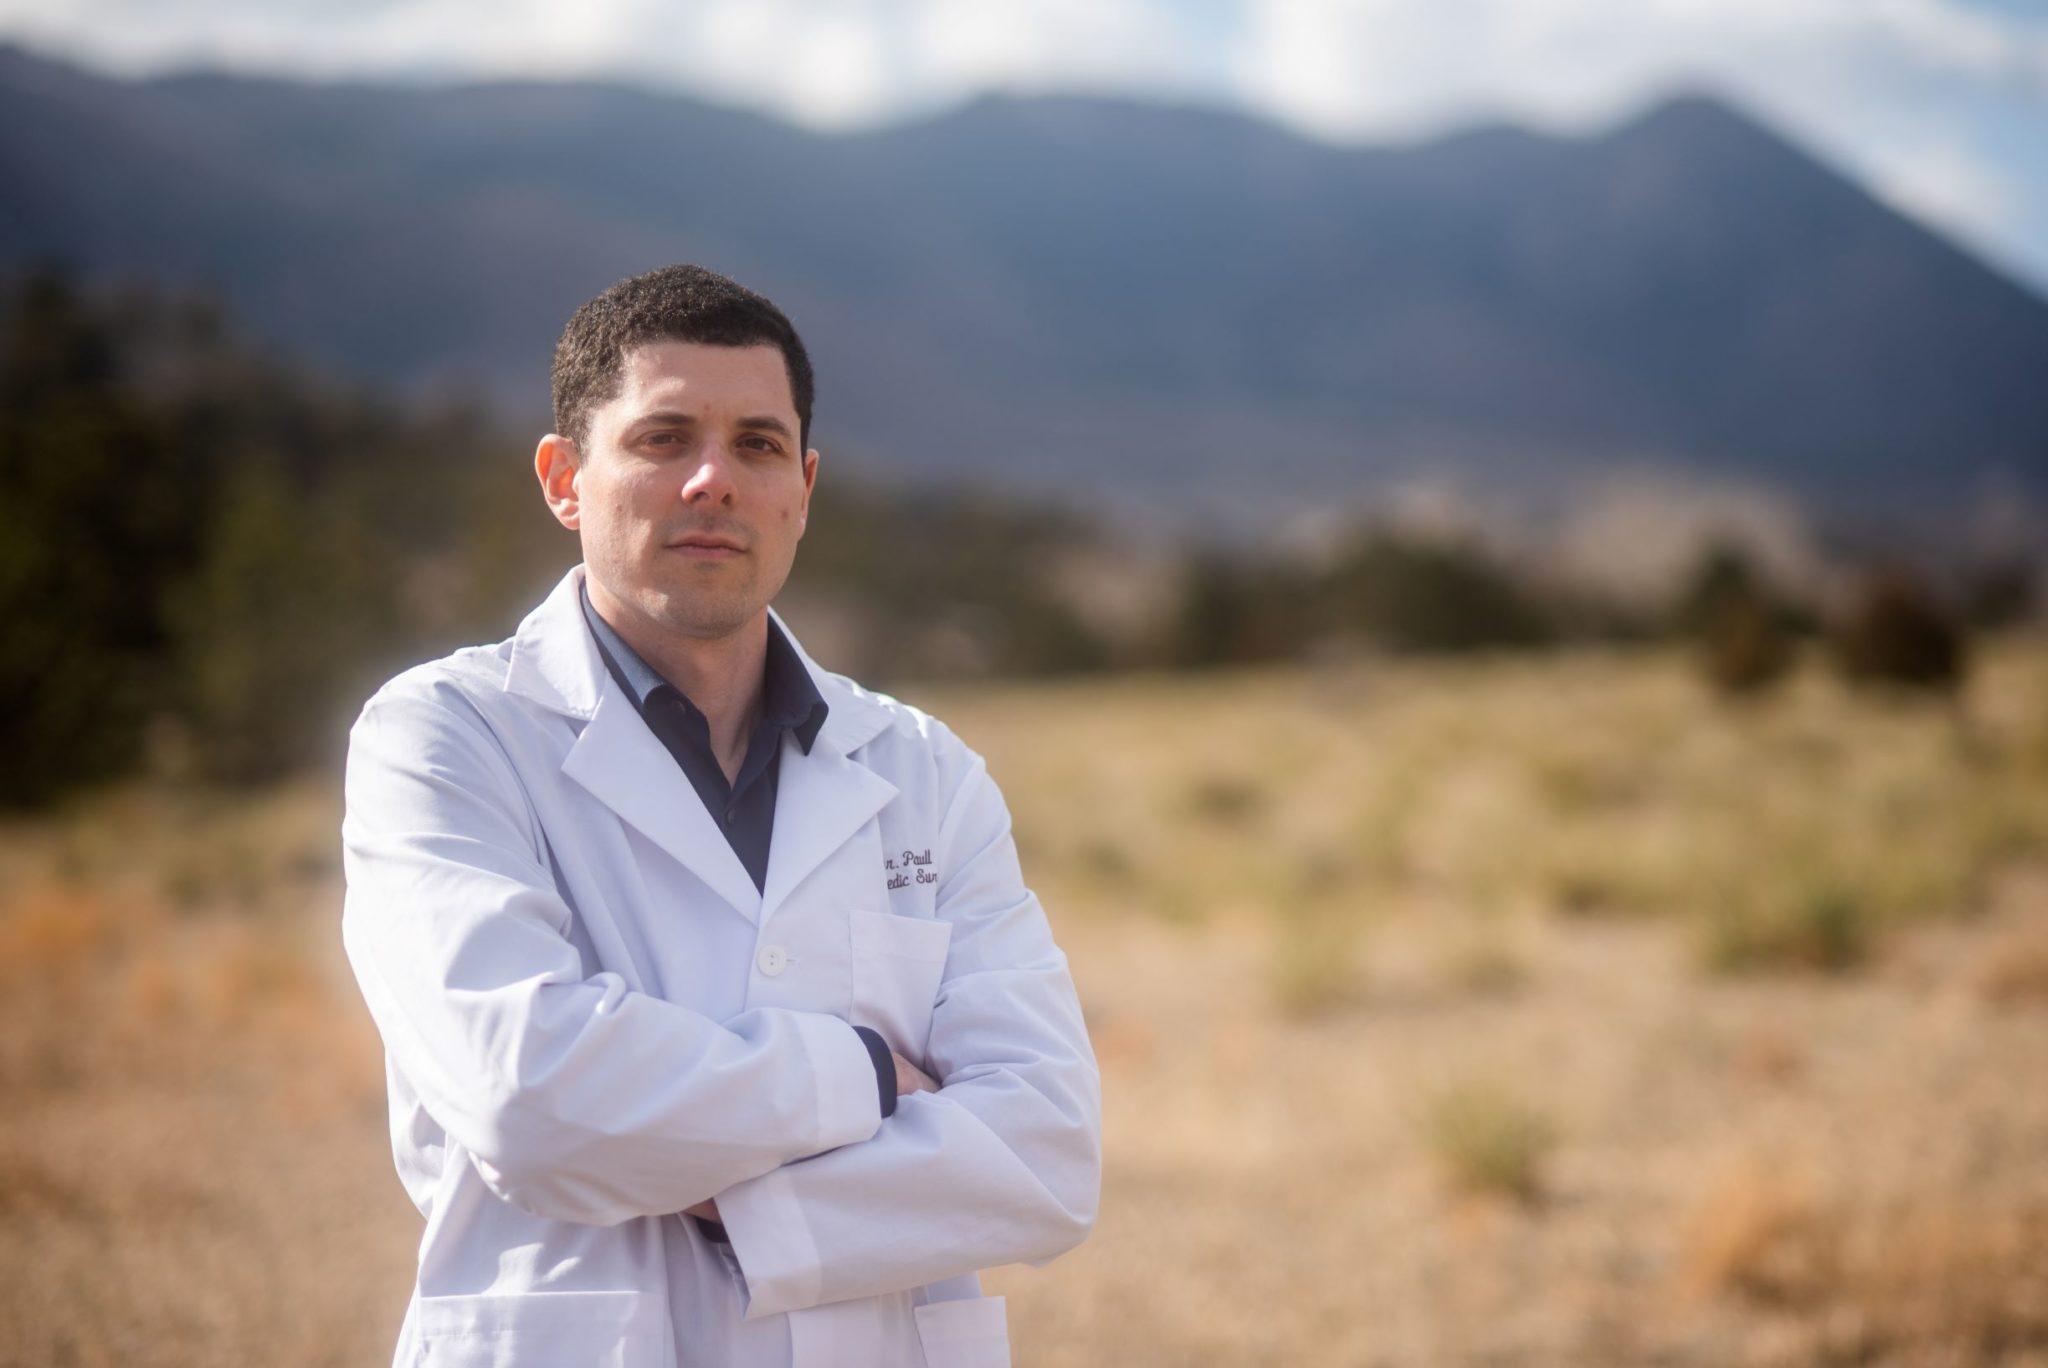 Colorado Springs Orthopedic Surgeon Dr. Daniel Paull Standing Picture